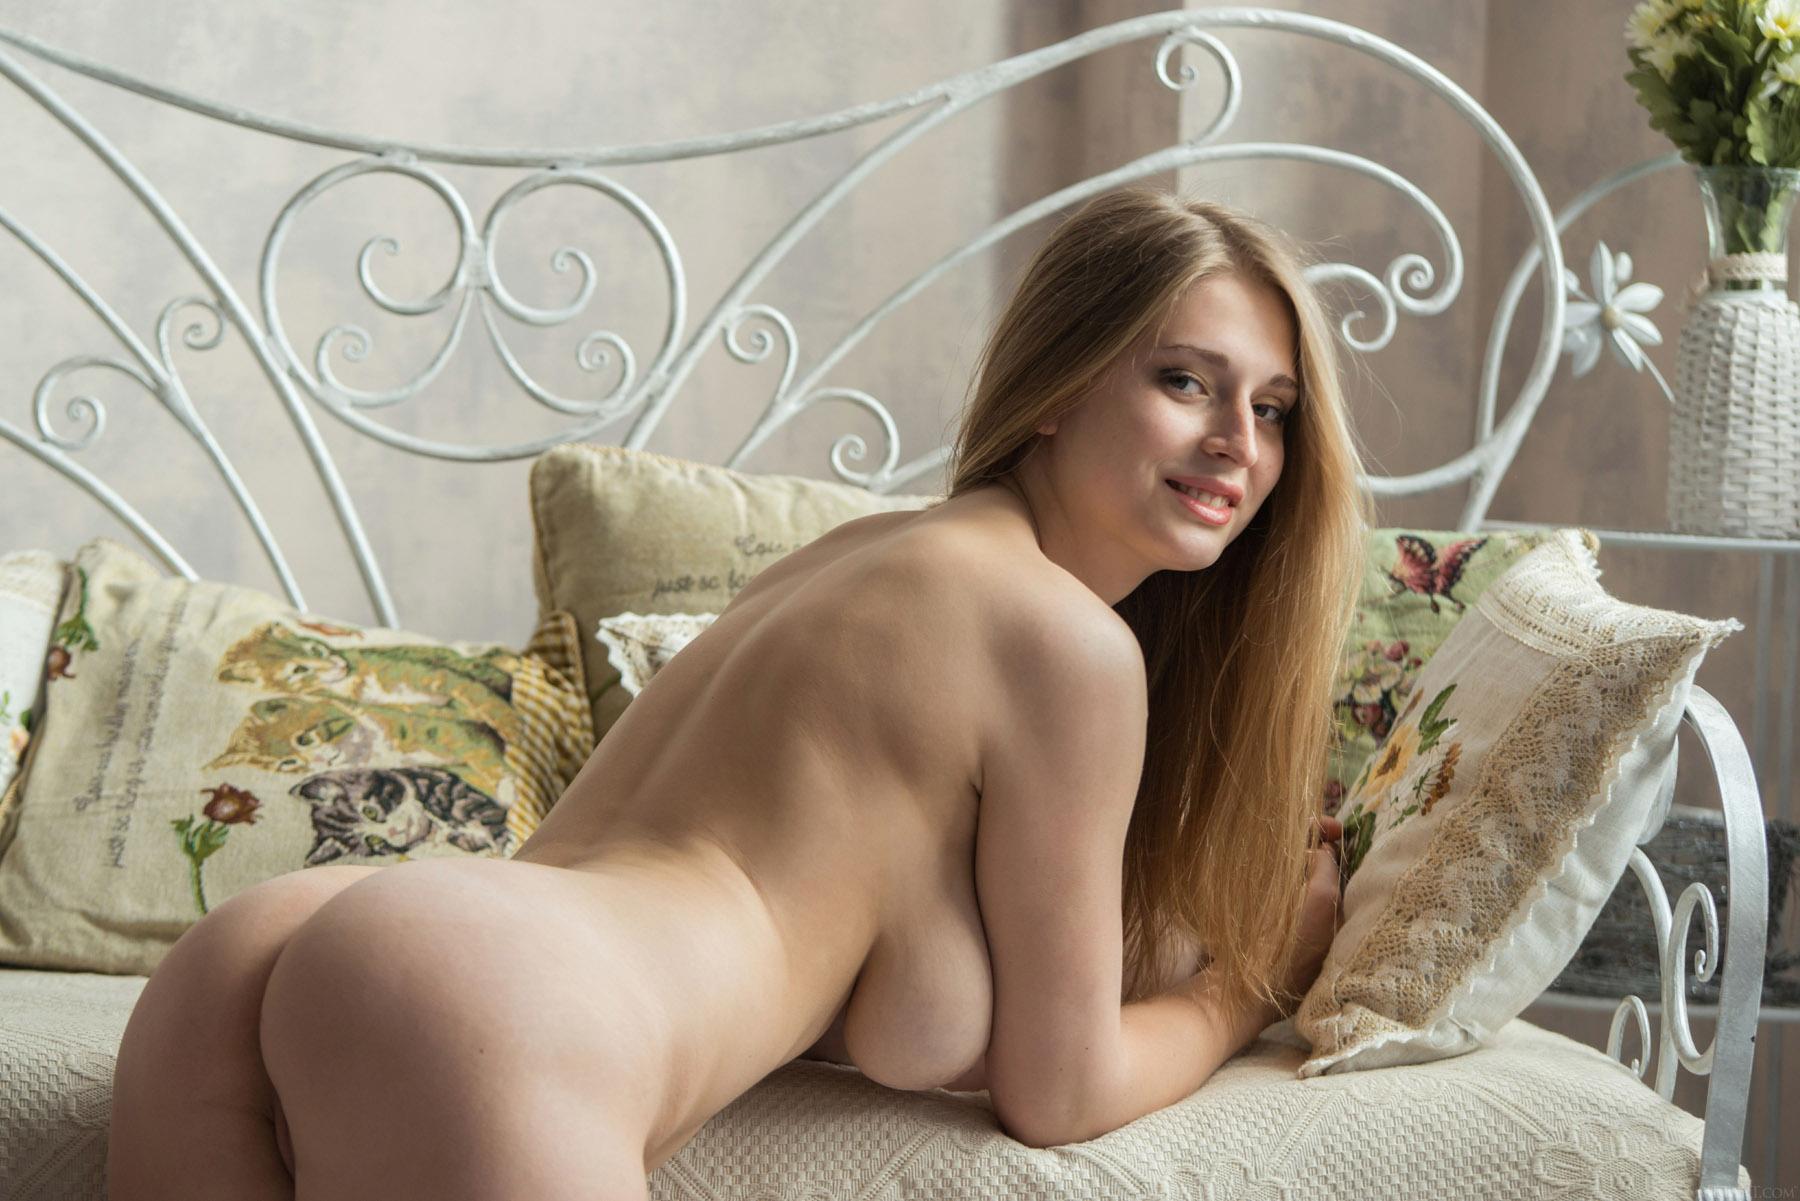 Sheela nude photo, extreme sex club